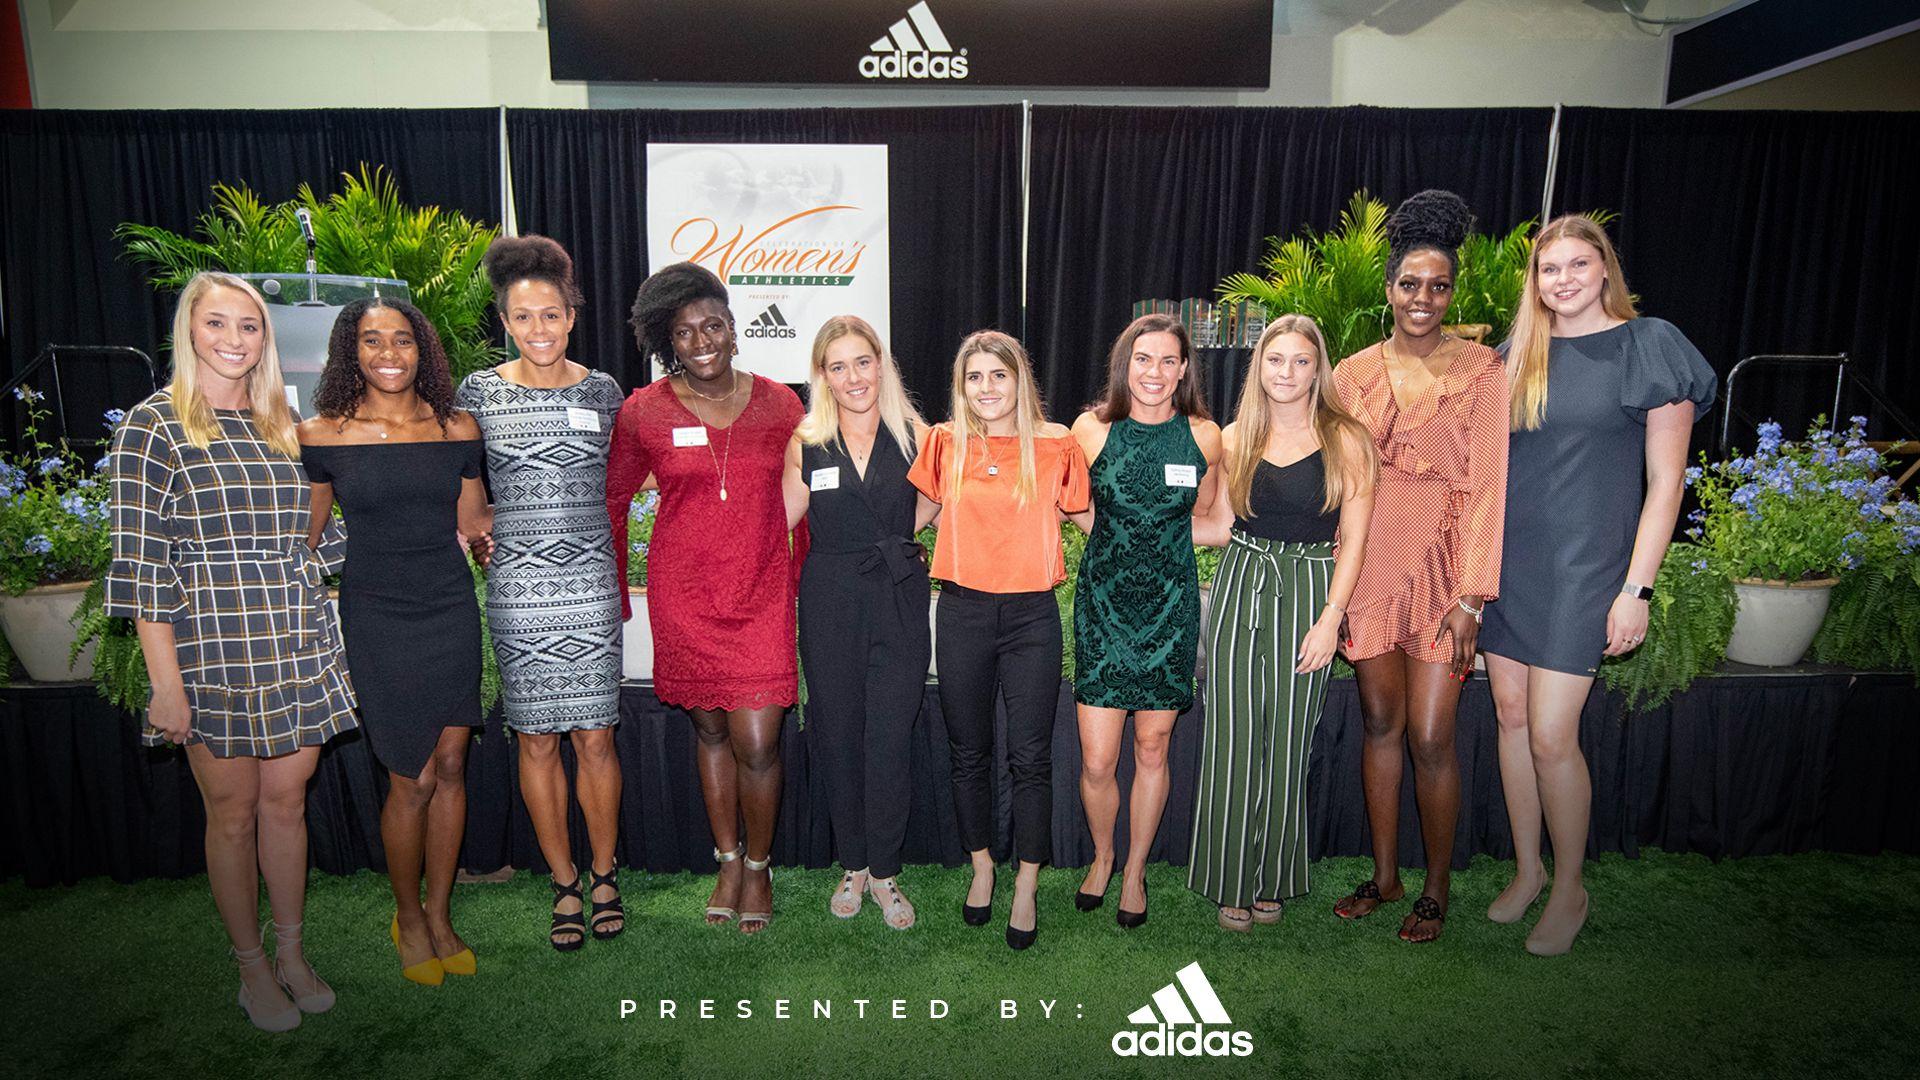 Miami Athletics Announces Date for Seventh Annual Celebration of Women's Athletics